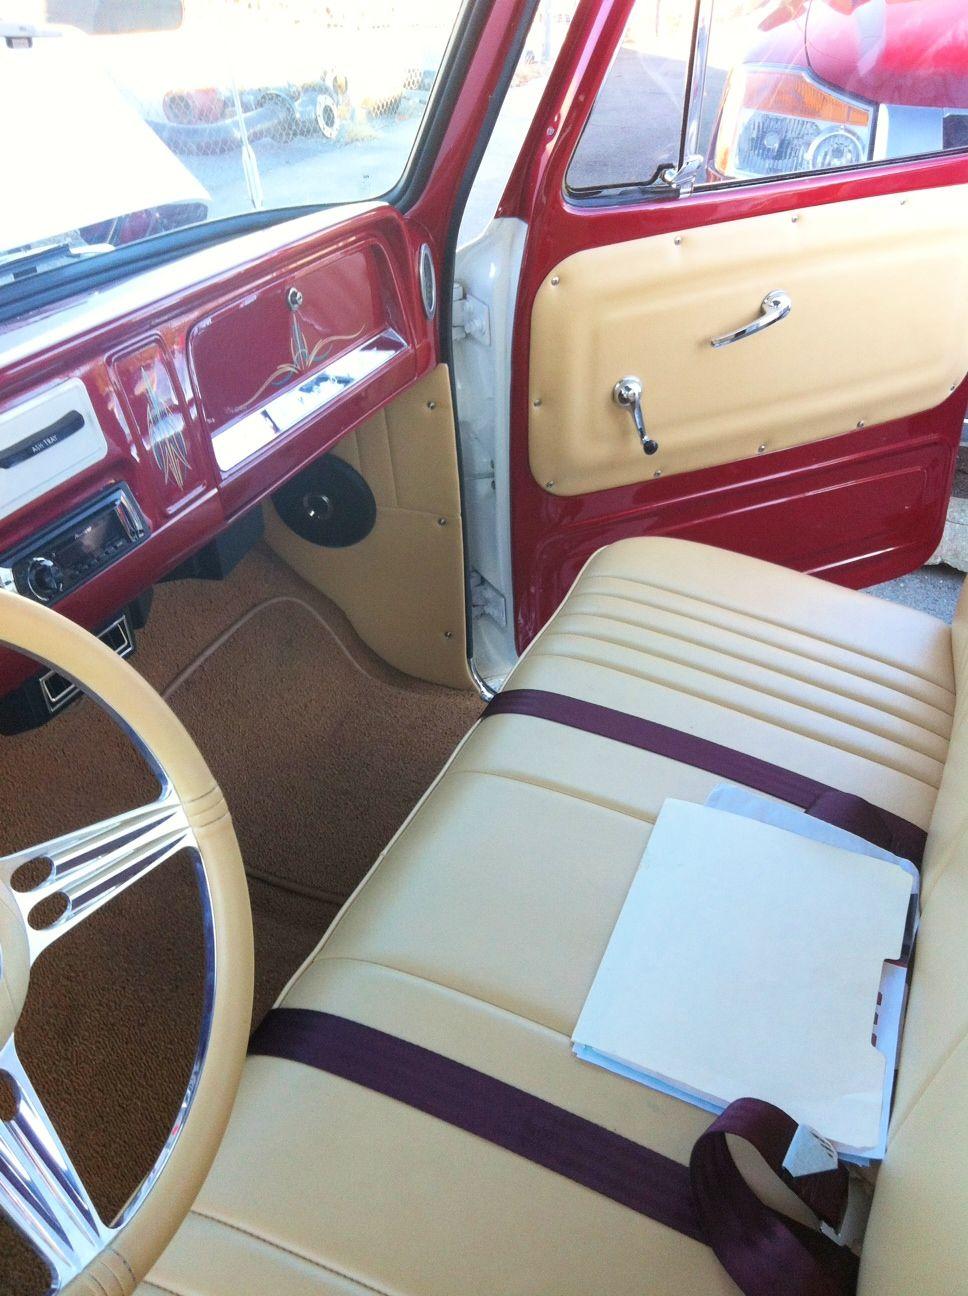 67 72 chevrolet truck vintage air install seems